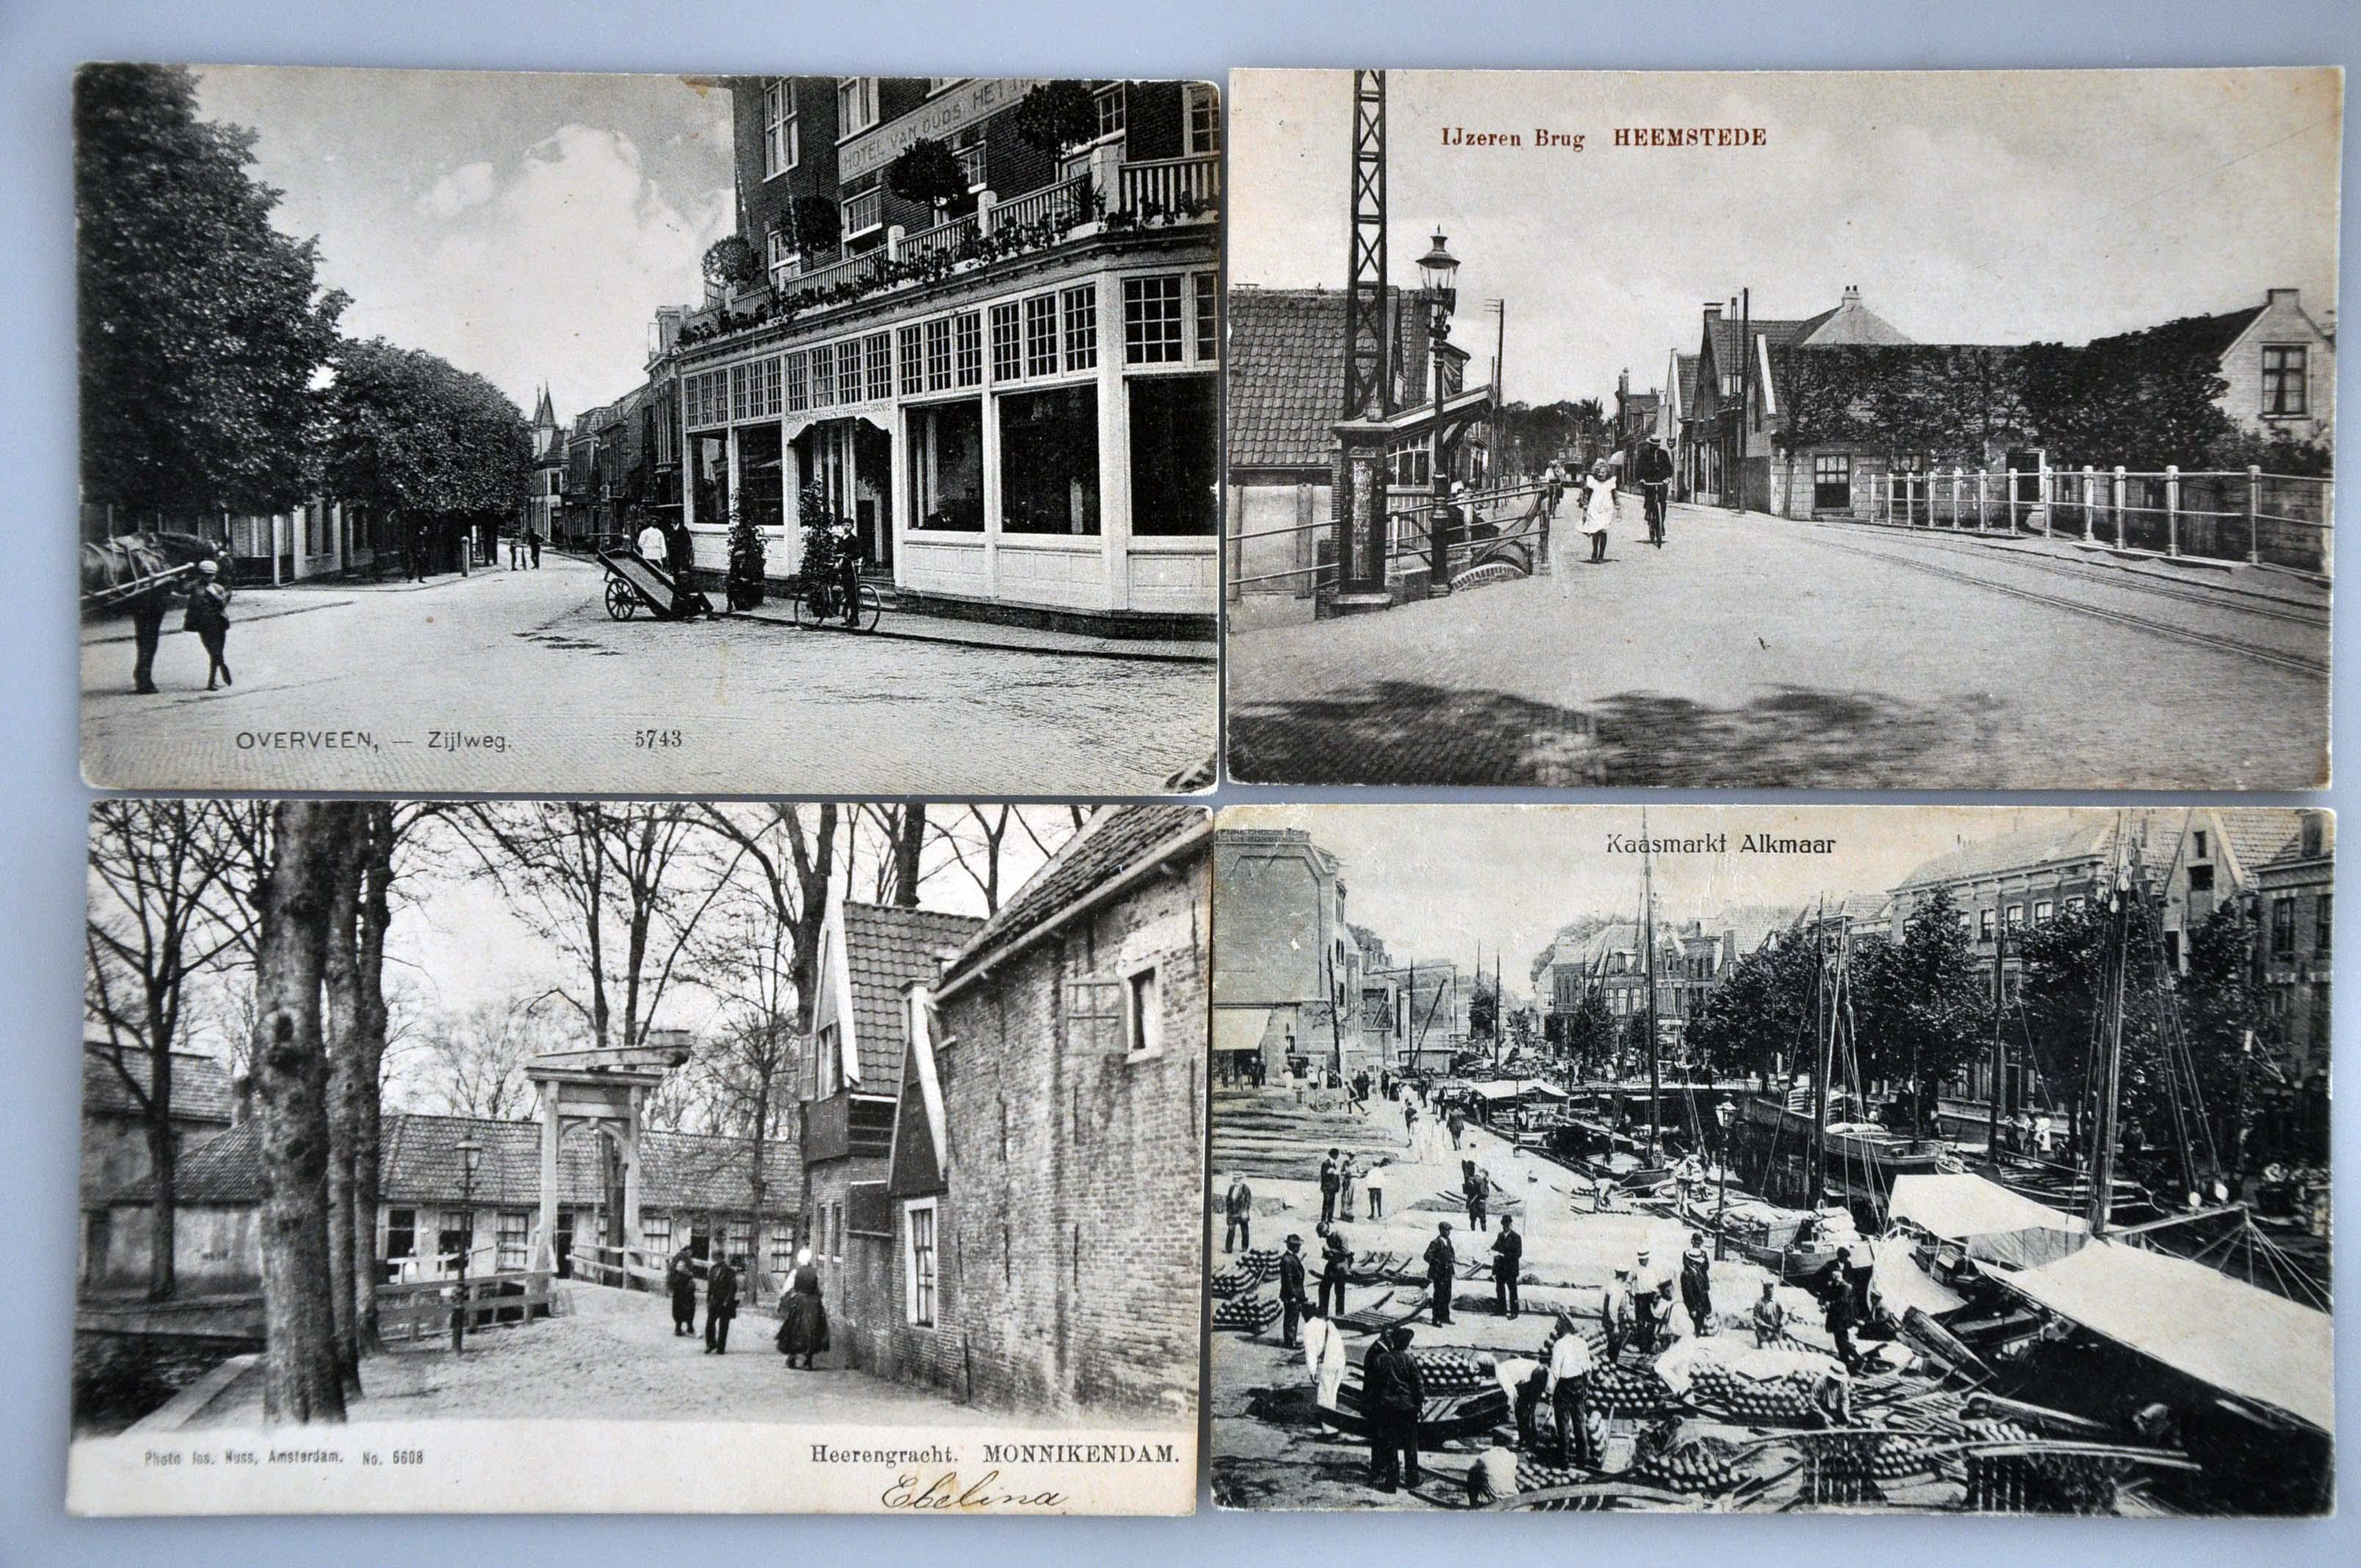 Lot 2409 - Netherlands and former colonies NL Noord-Holland -  Corinphila Veilingen Auction 237 Part 2: General sale